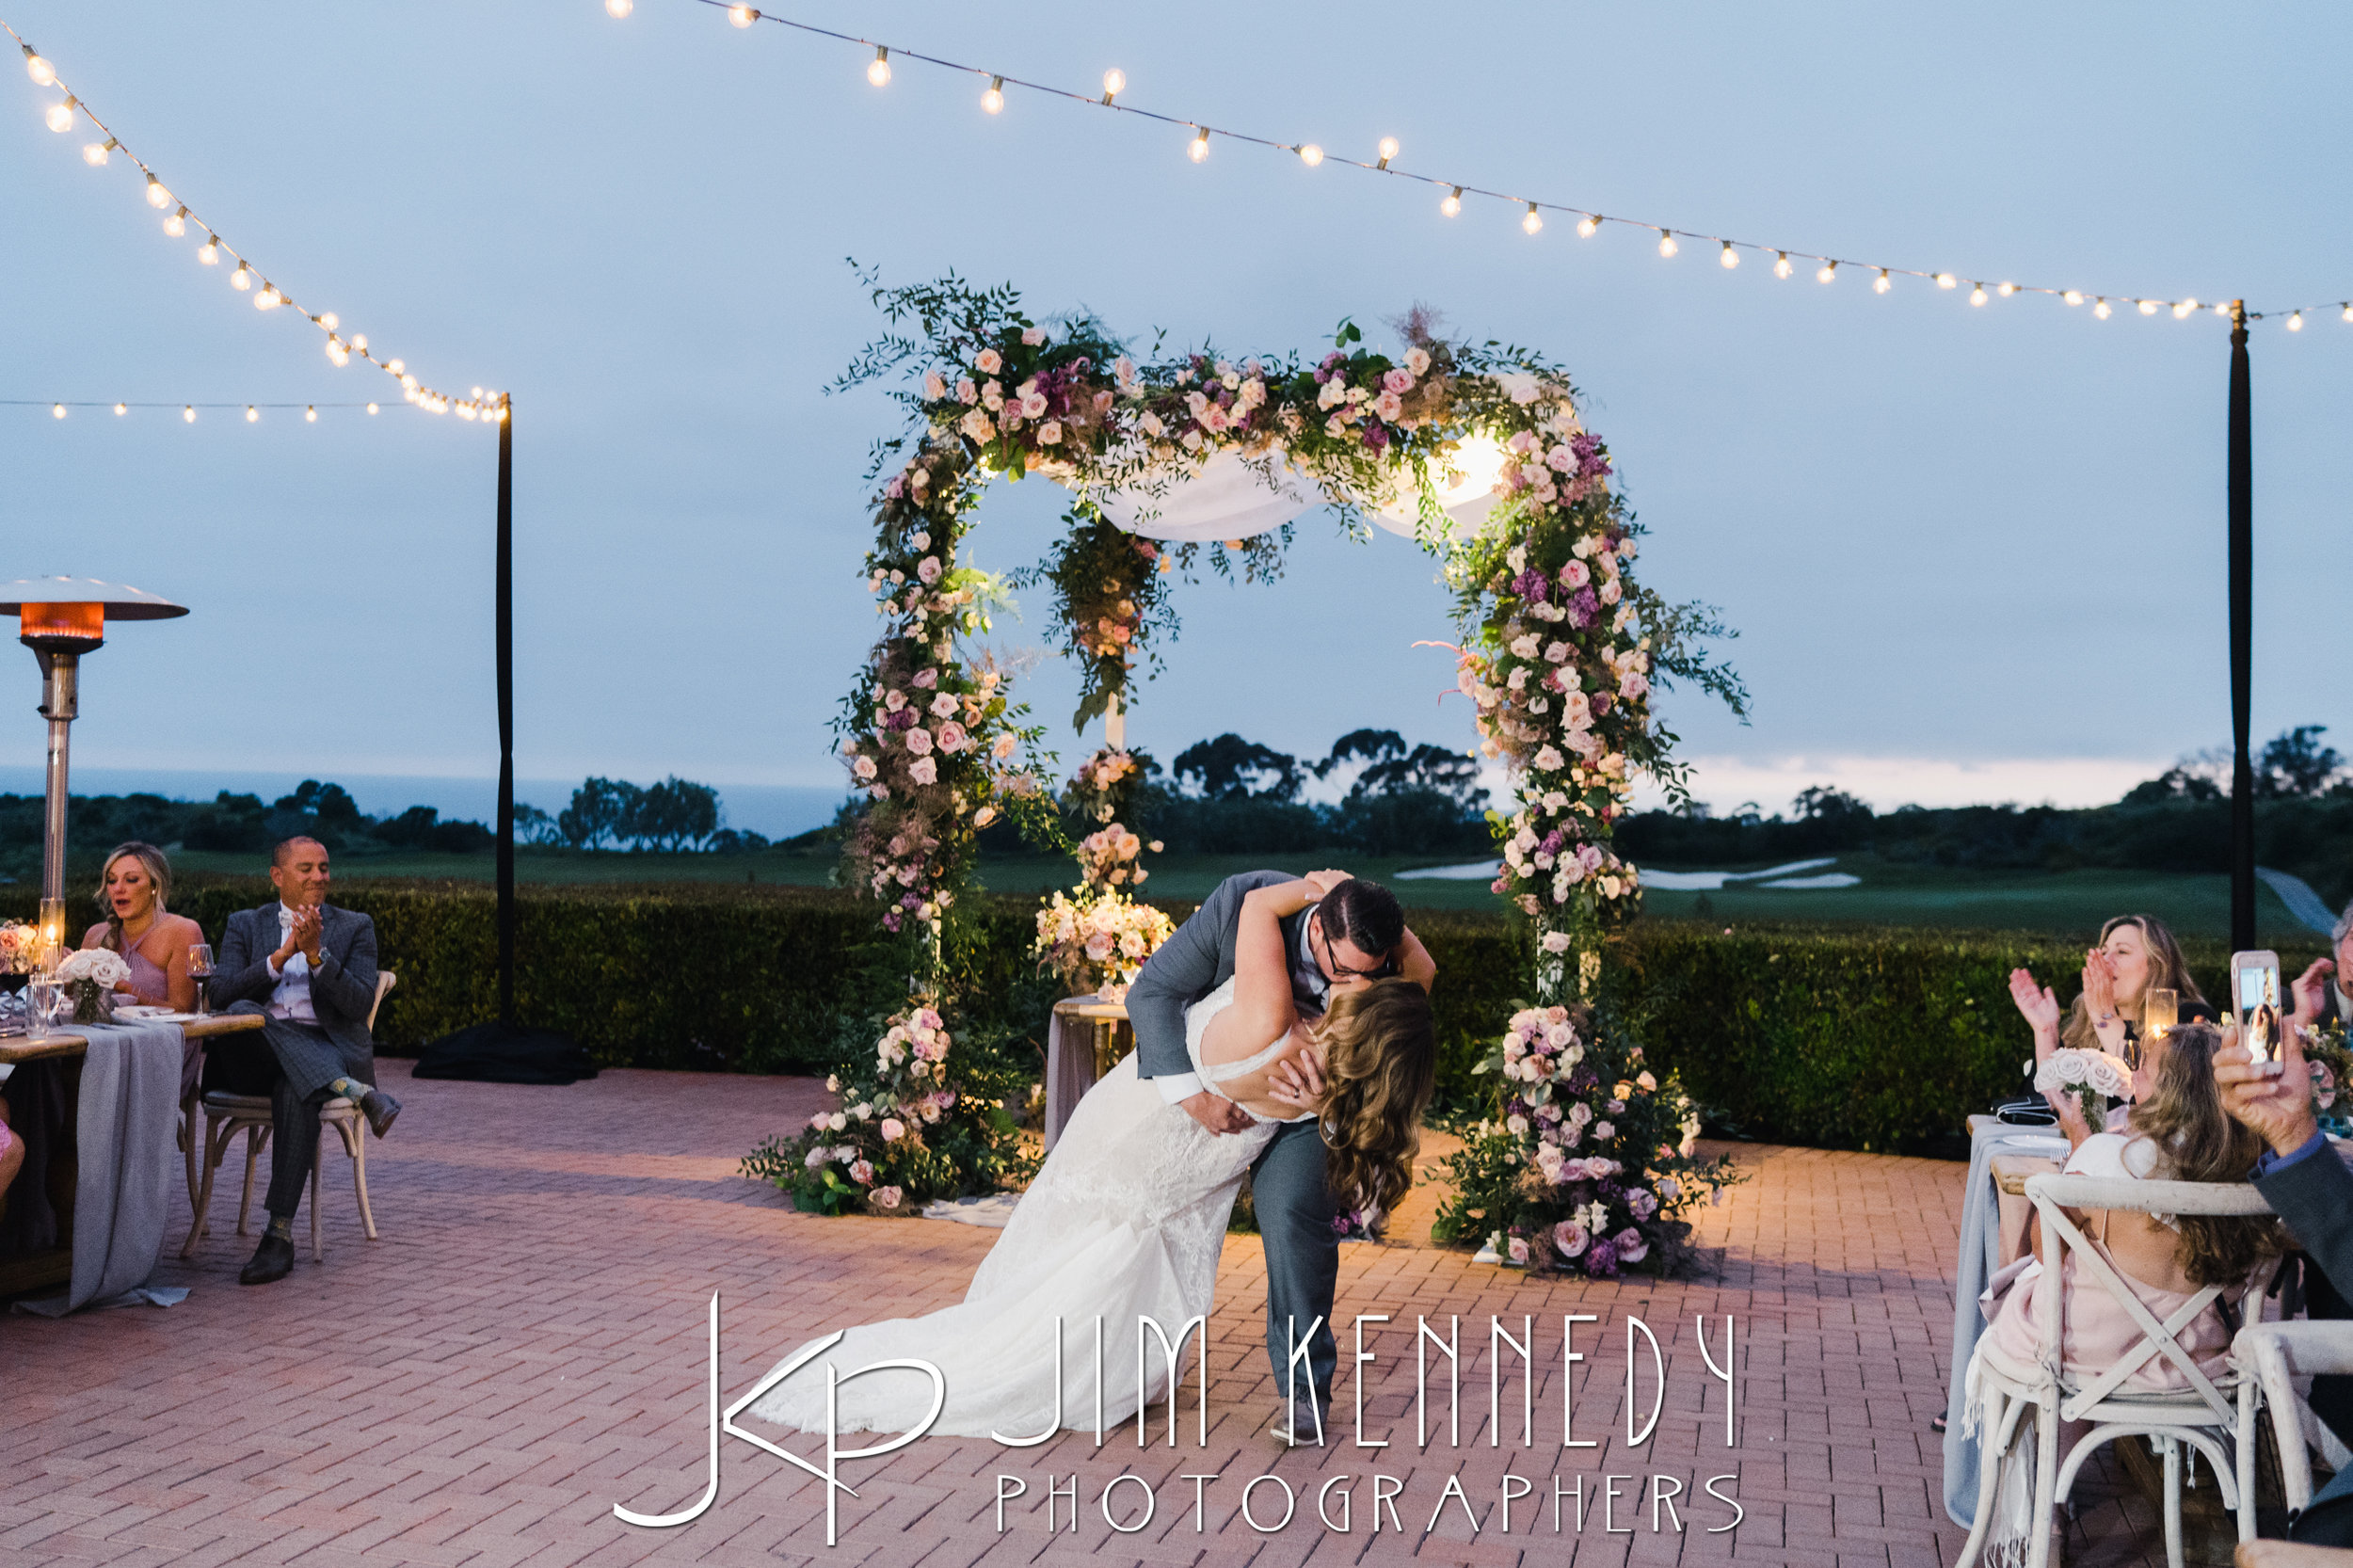 pelican-hill-wedding-jim-kenedy-photographers_0222.JPG